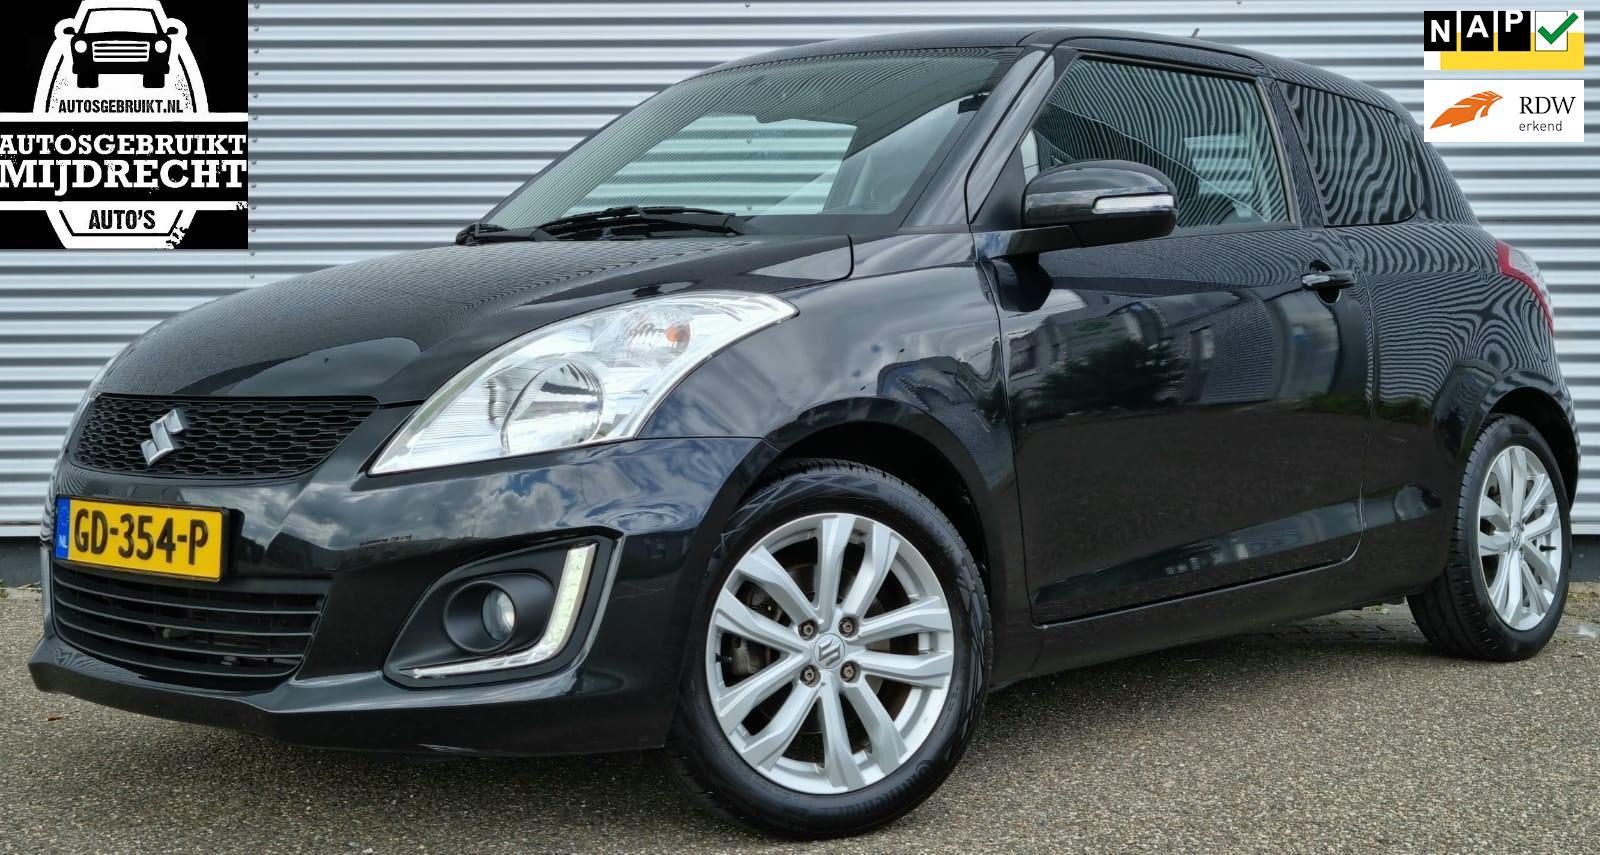 Suzuki Swift occasion - Autosgebruikt Mijdrecht